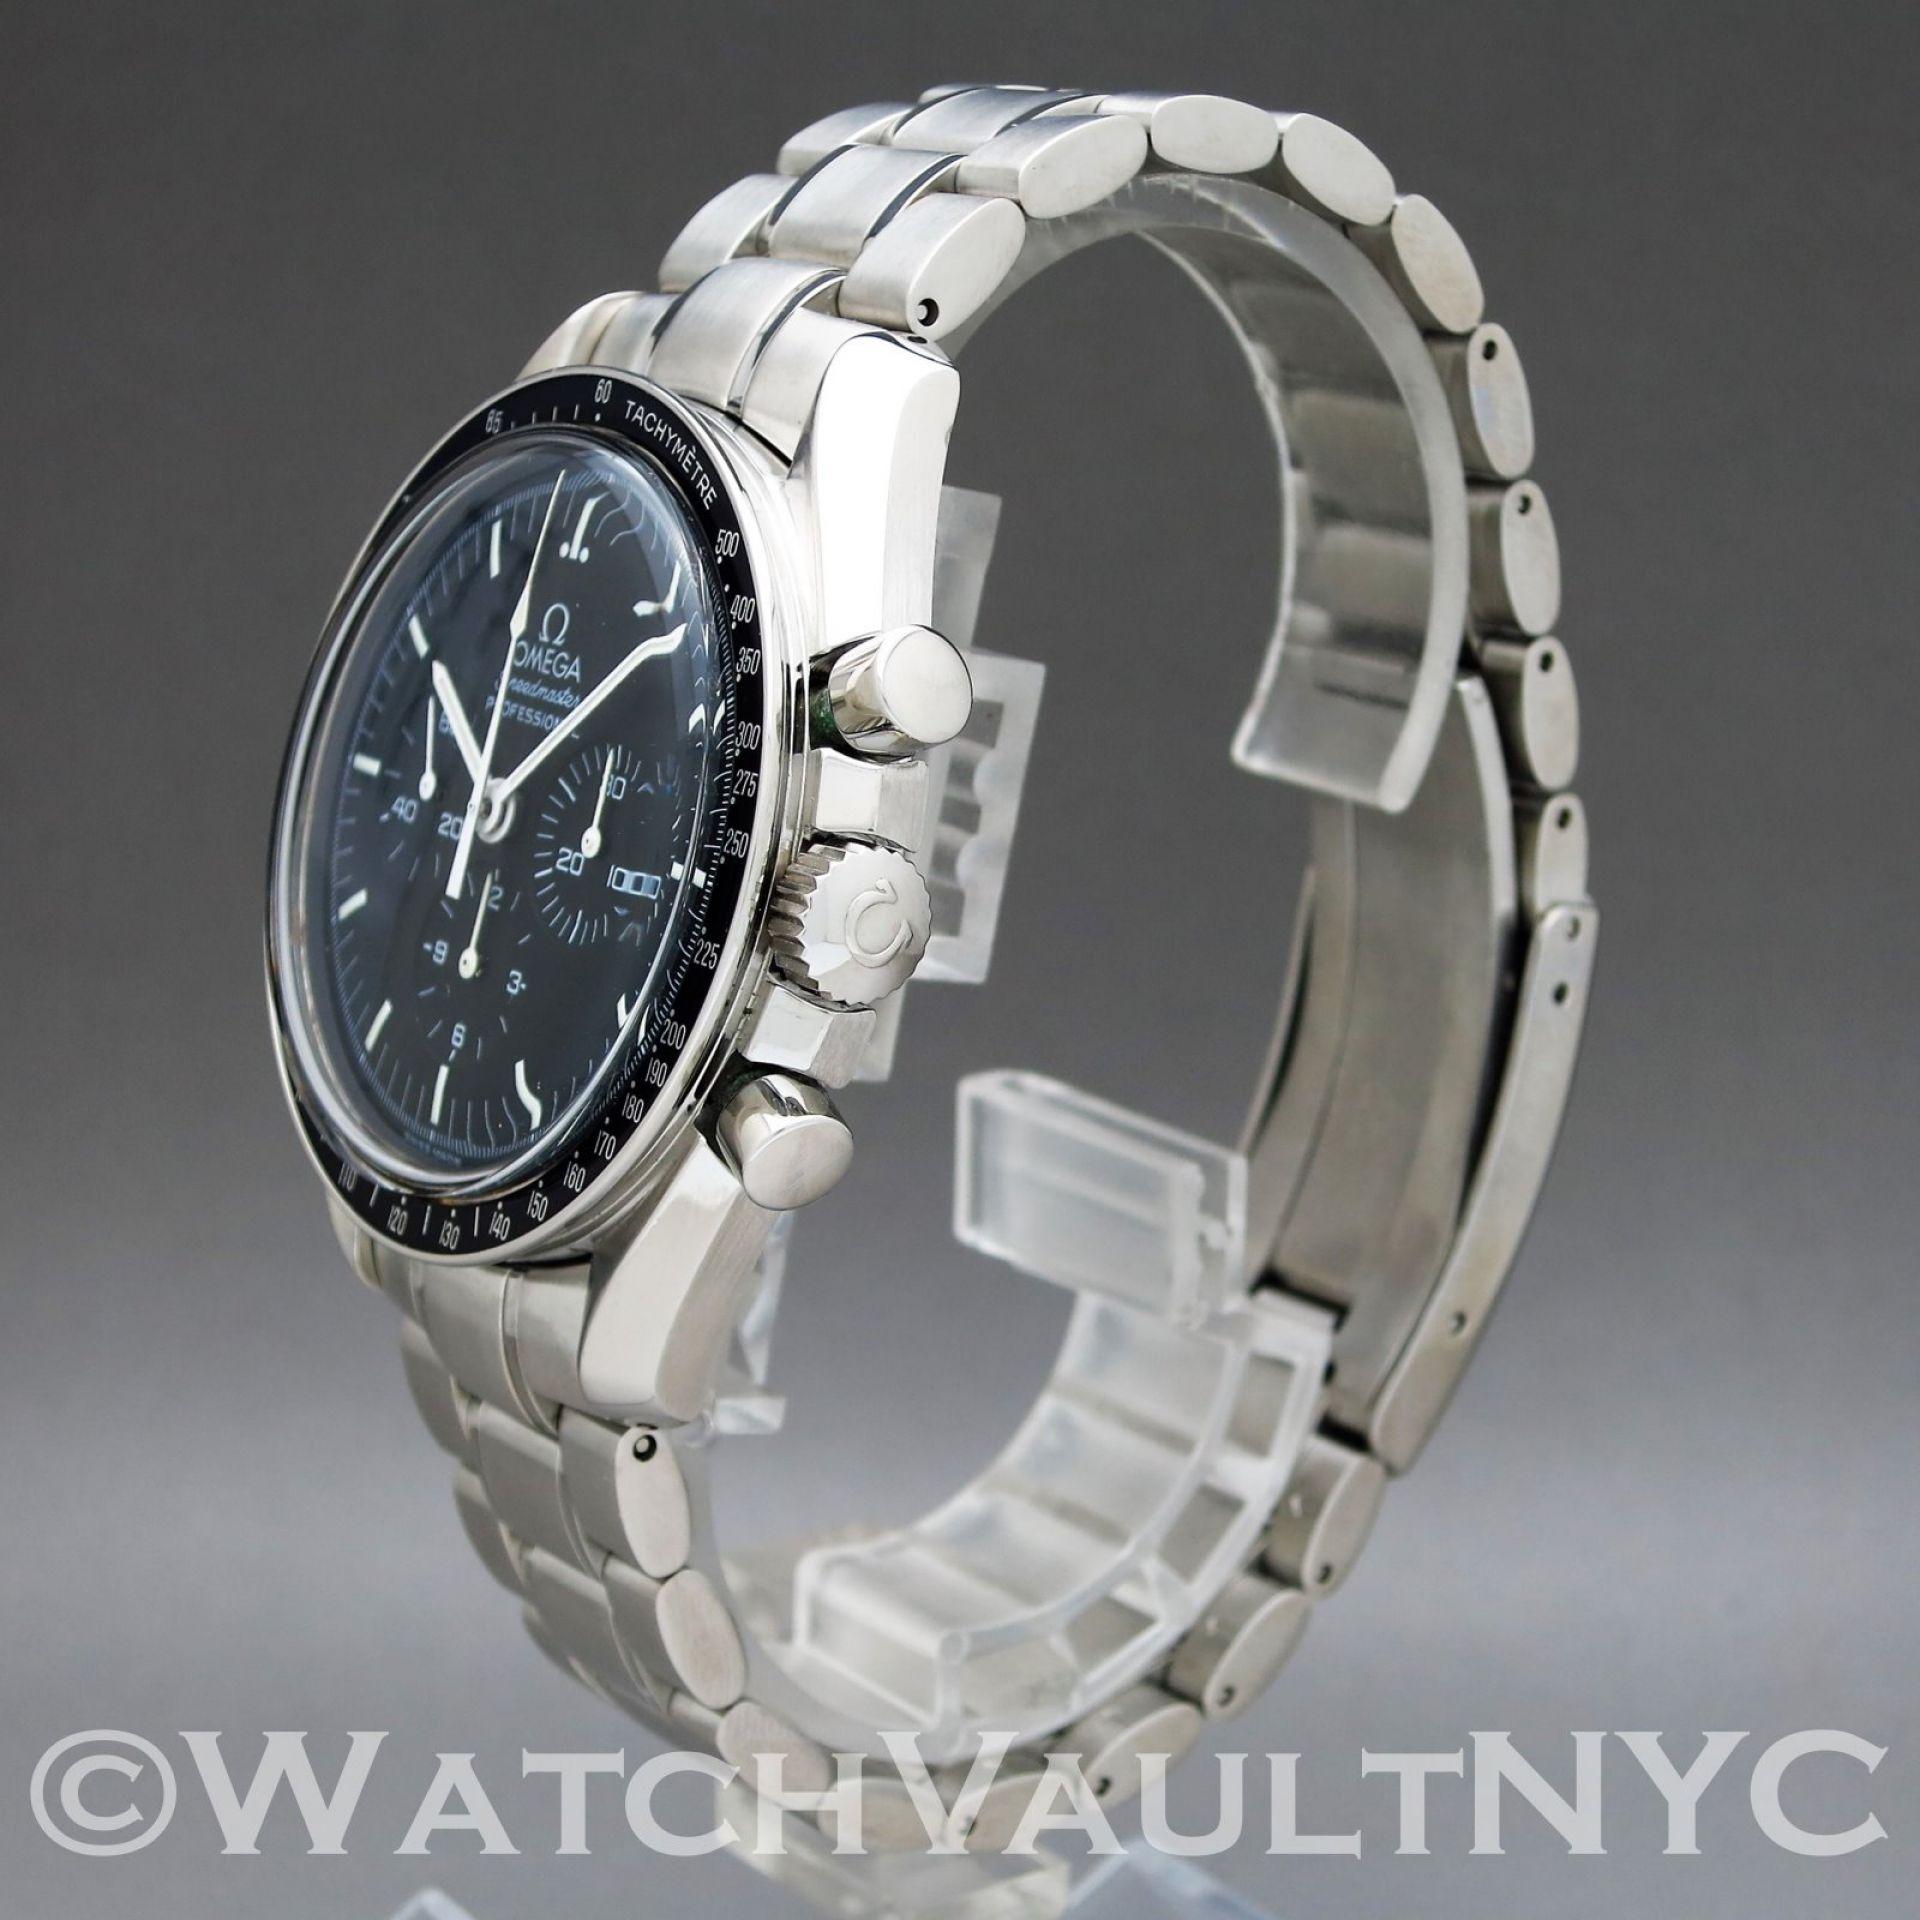 Omega Speedmaster Professional Moonwatch 3560.50 30th Anniverary Apollo XI RH102